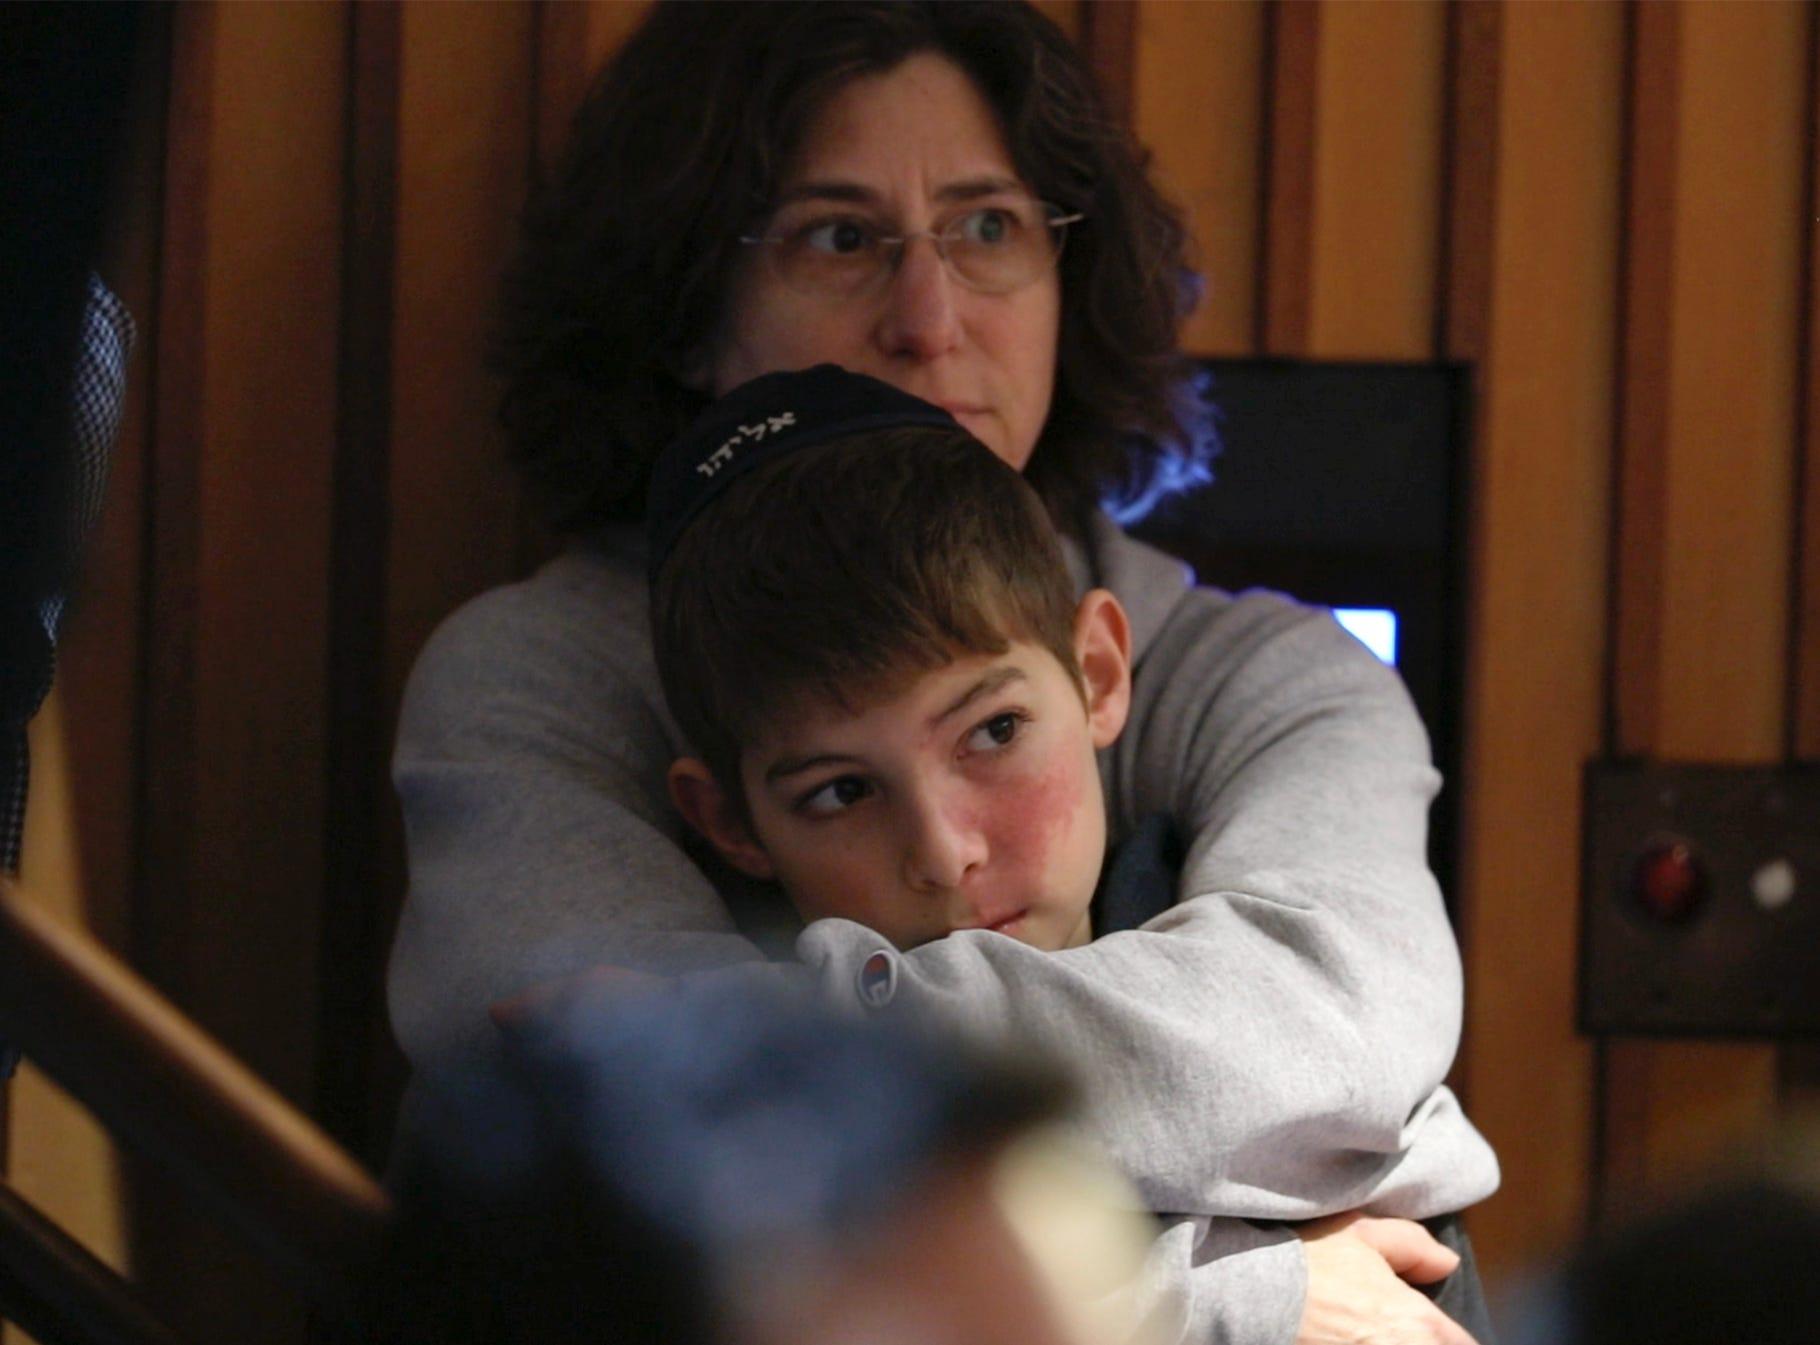 Francine Barnett holds her son, Elijah, as they listen to the speakers.